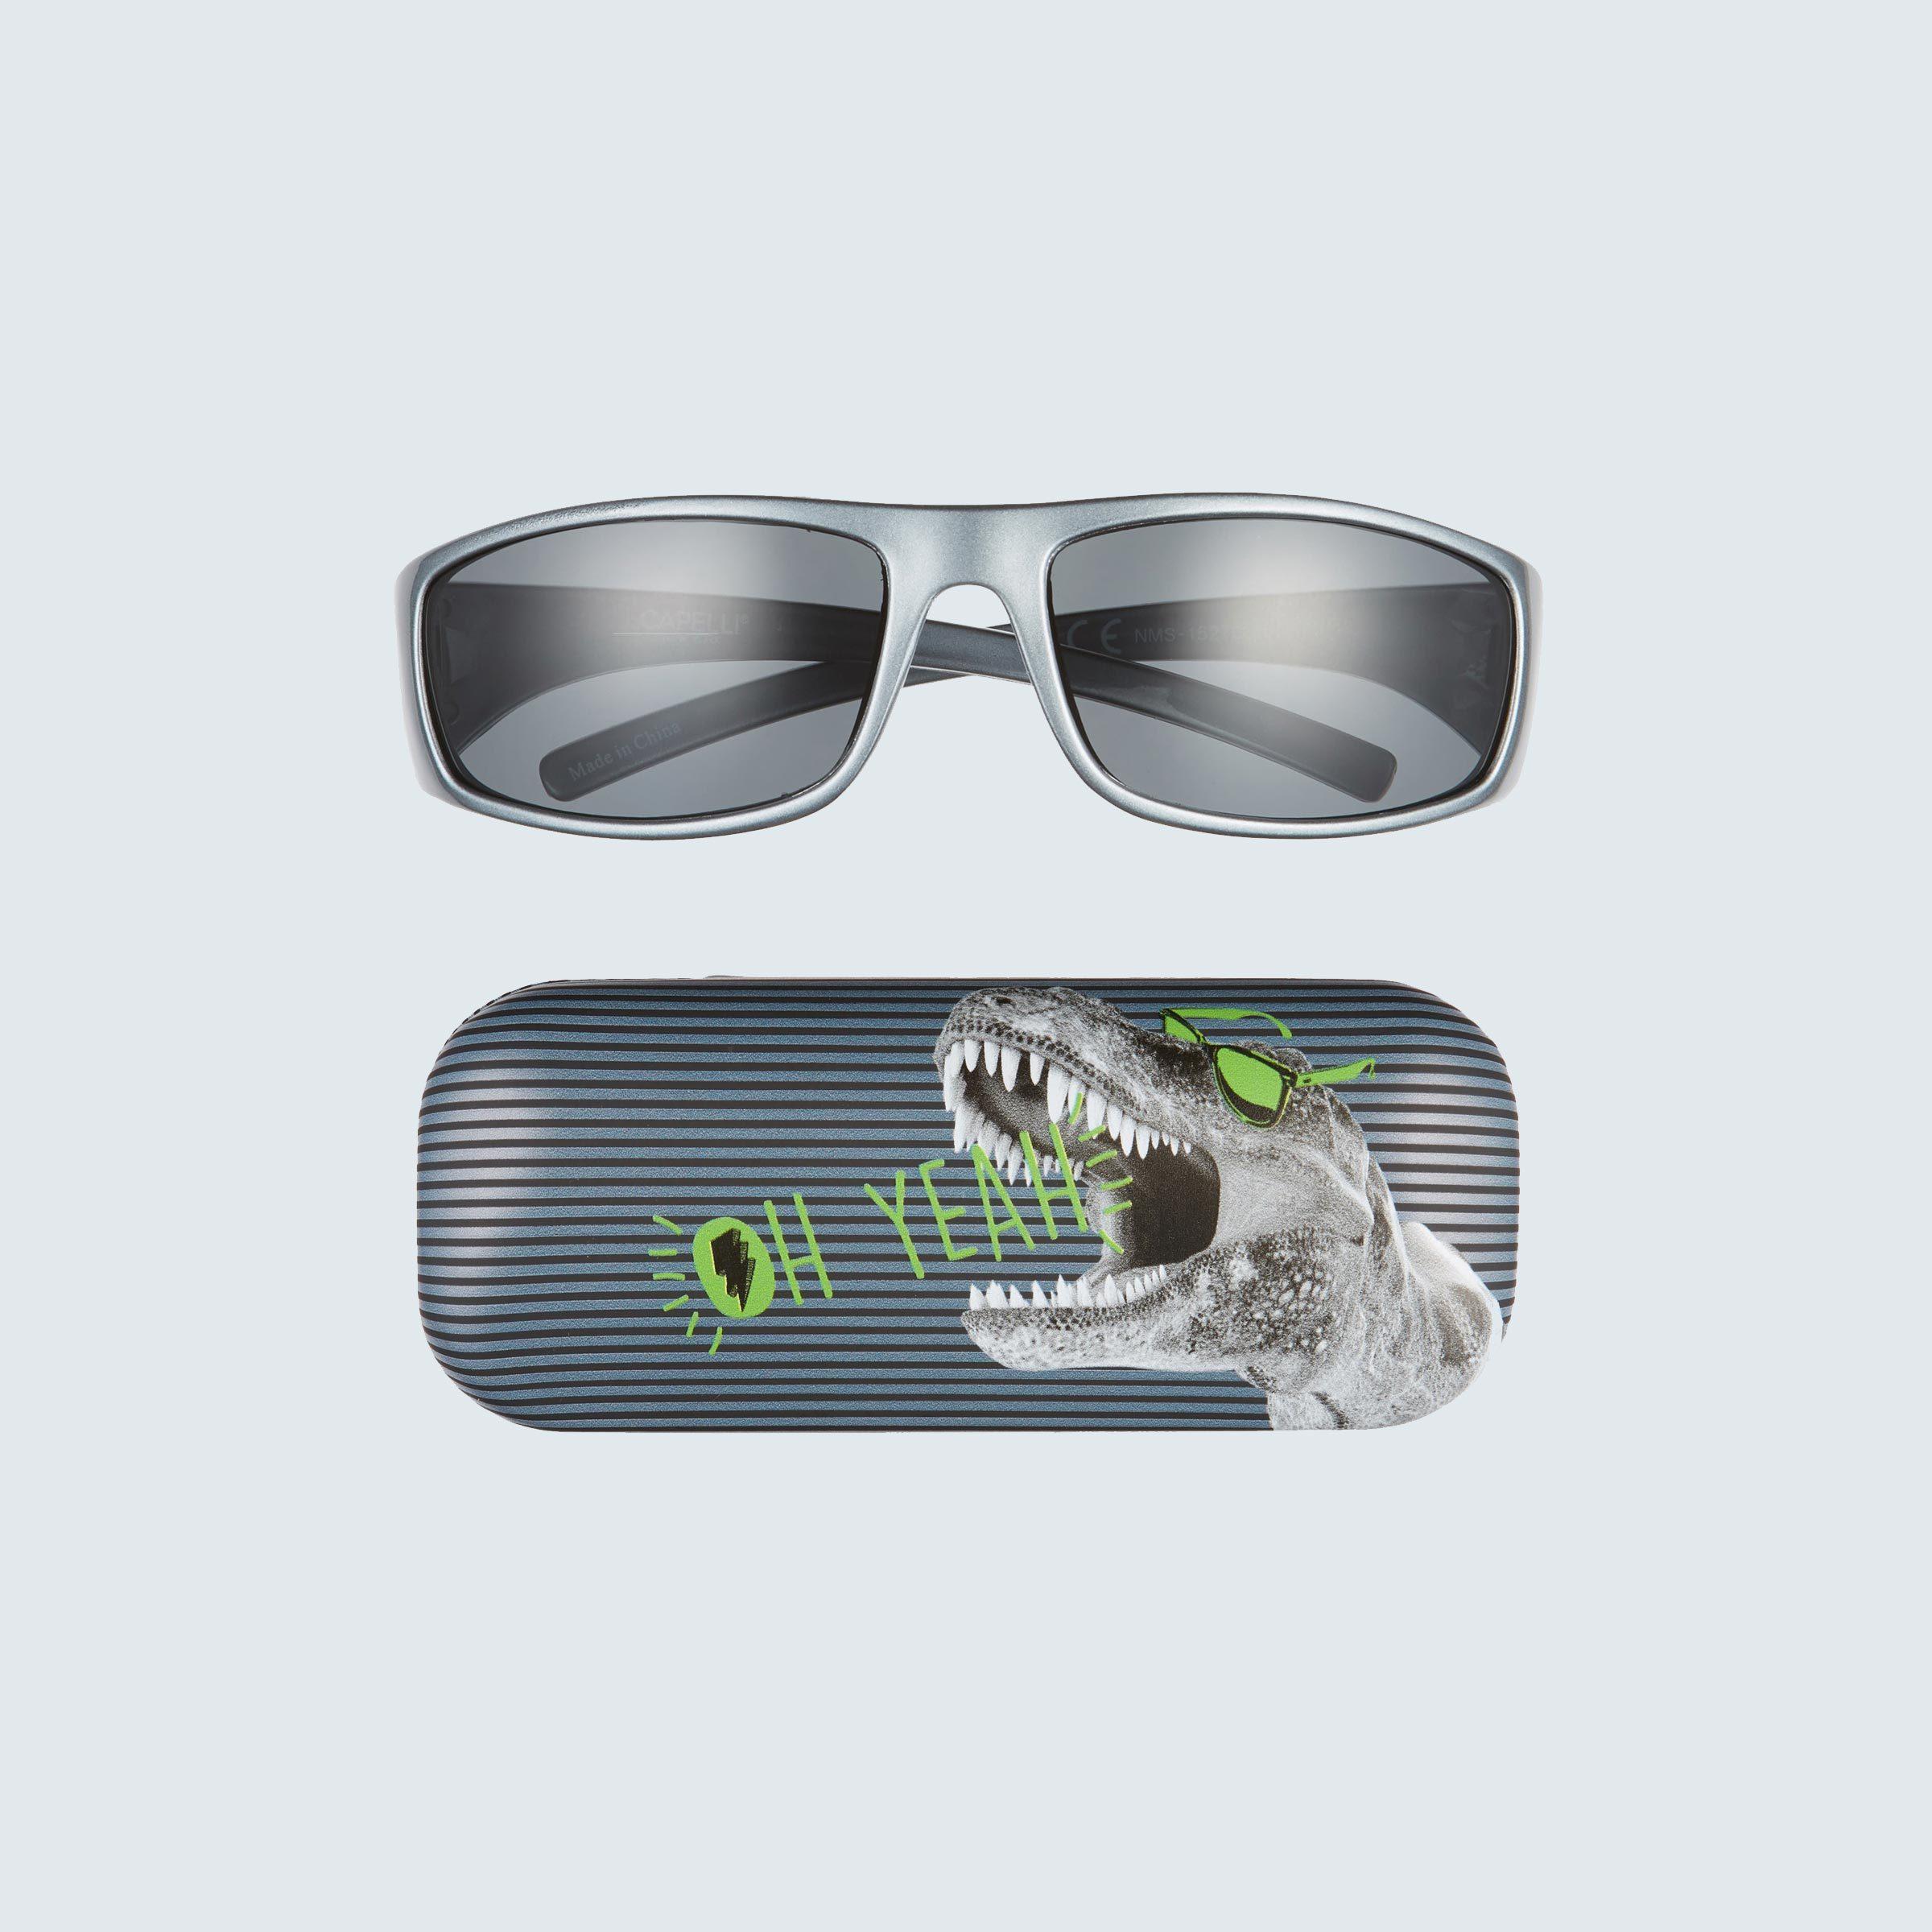 Best cheap sunglasses for boys